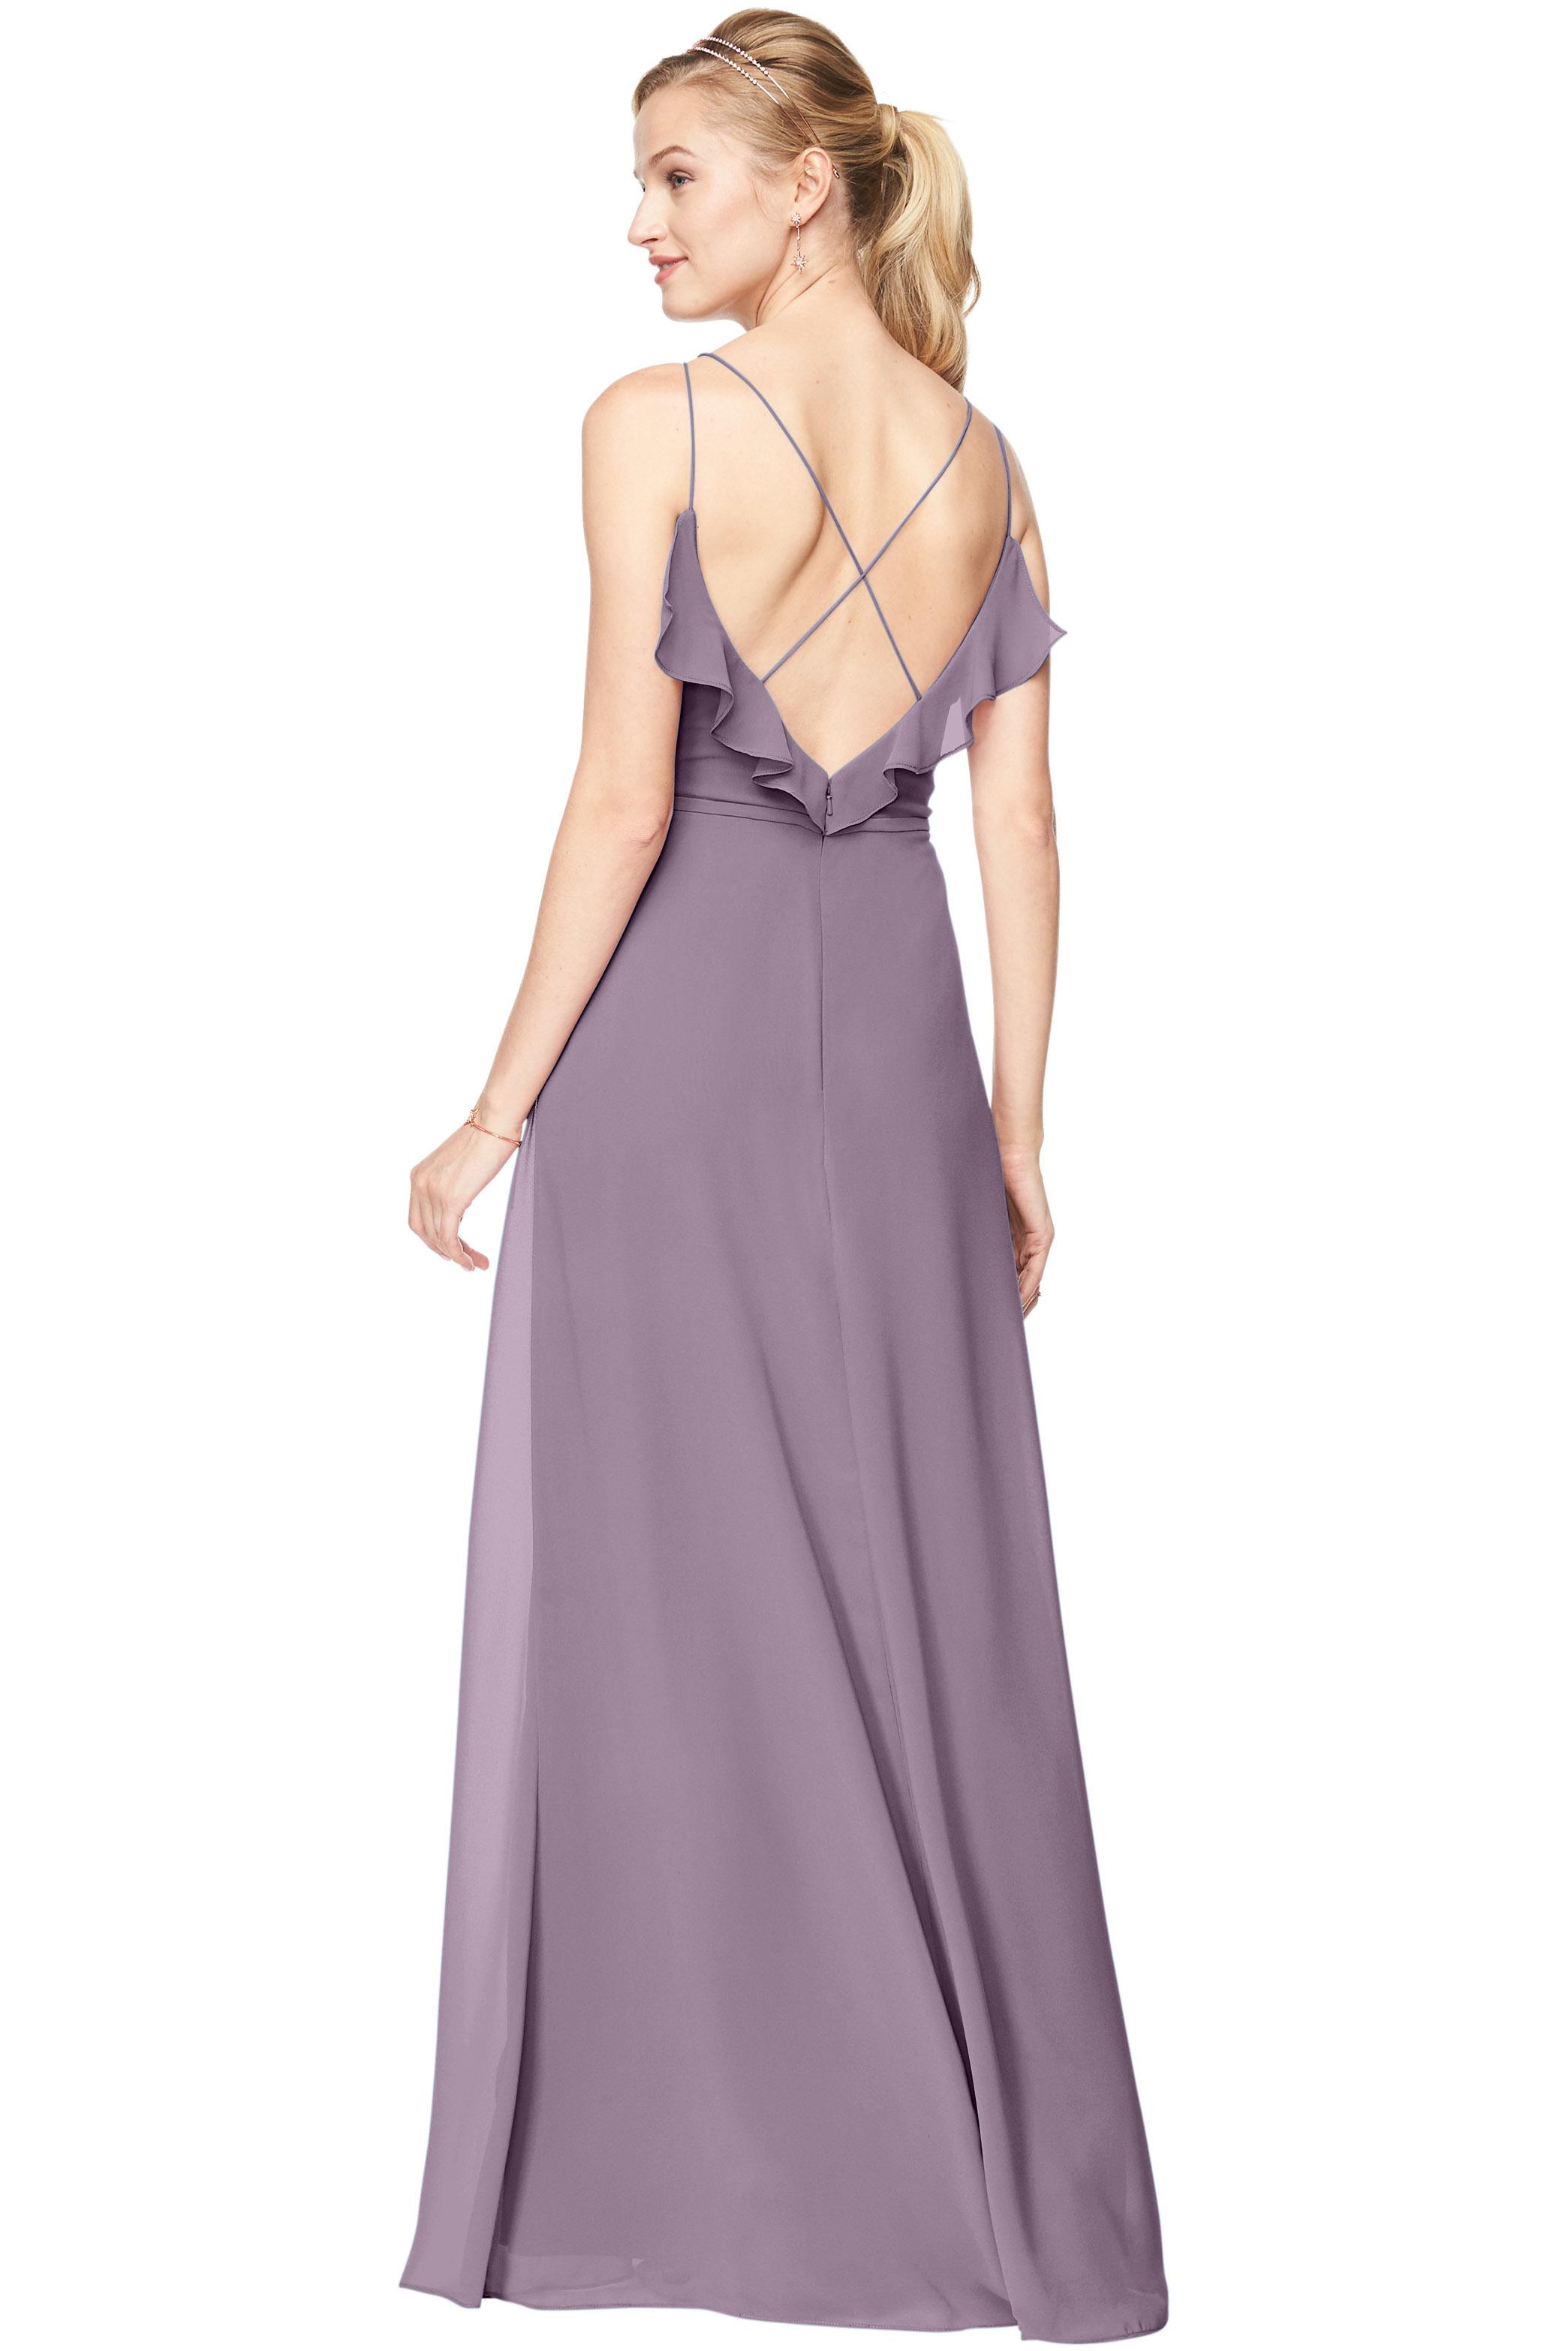 Bill Levkoff VICTORIAN LILAC Chiffon V-Neck A-line gown, $198.00 Back